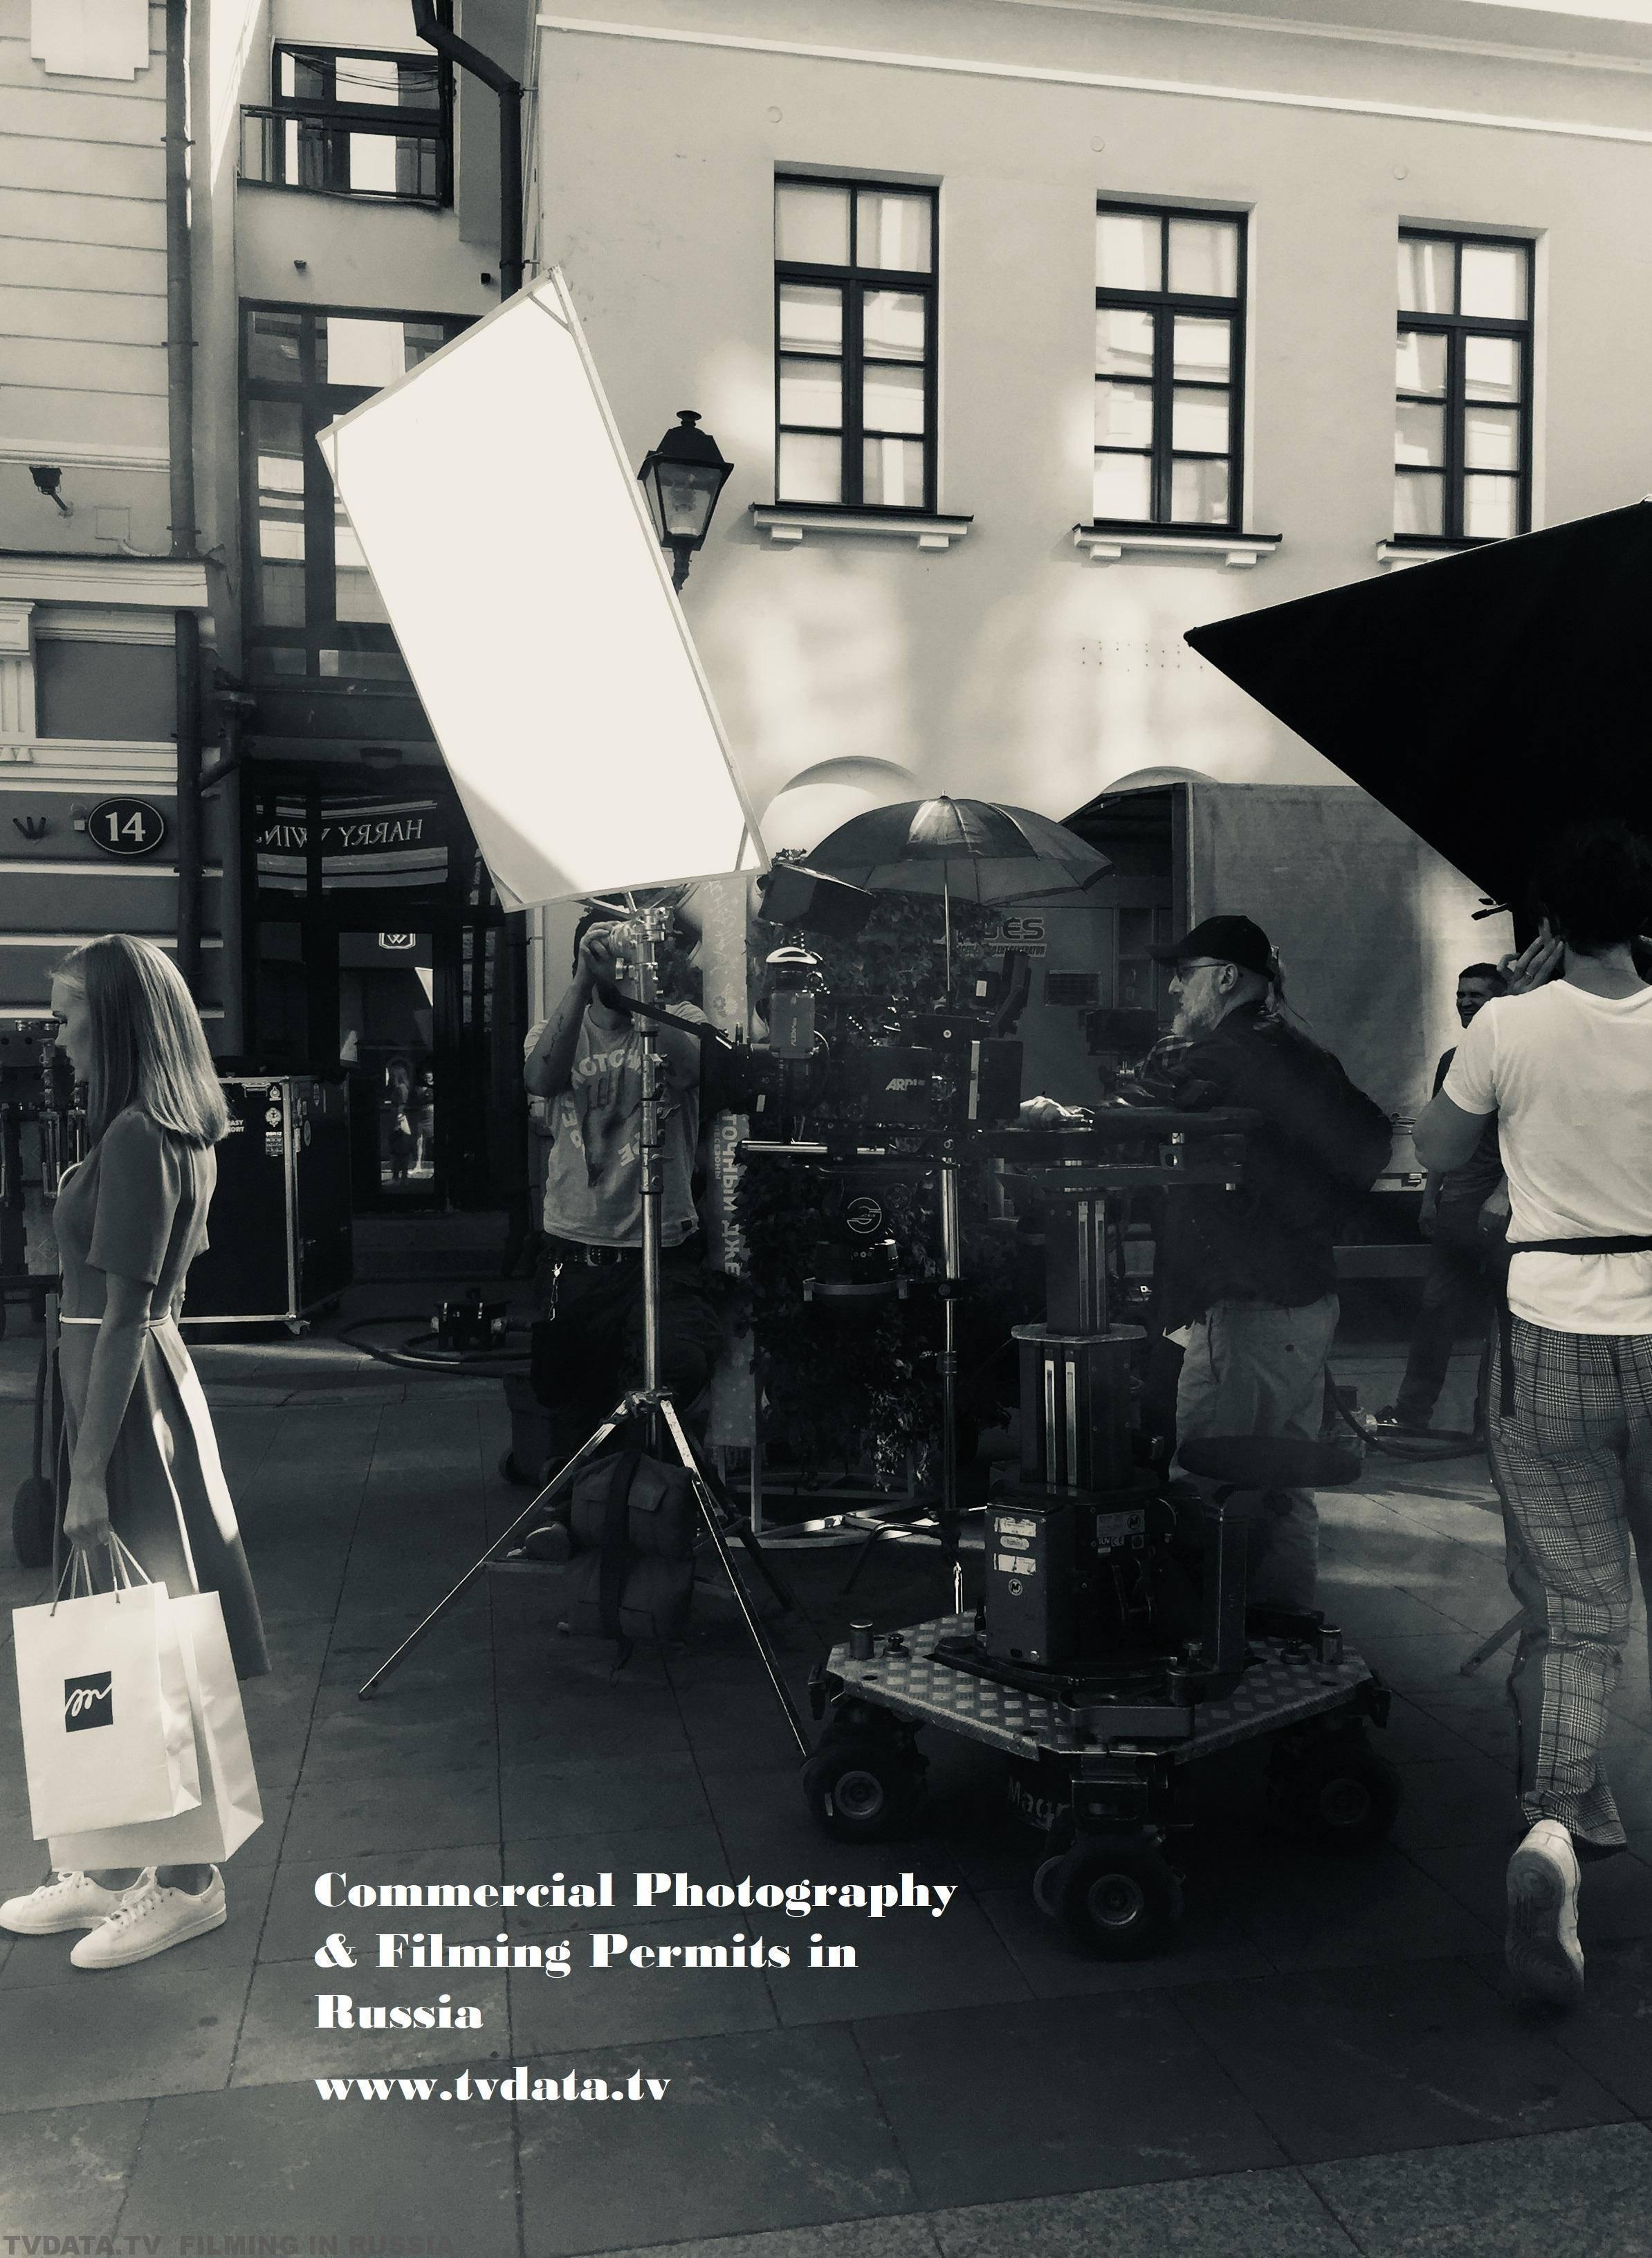 COMMERCIALPHOTOGRAPHY &FILMINGPERMITS IN RUSSIA